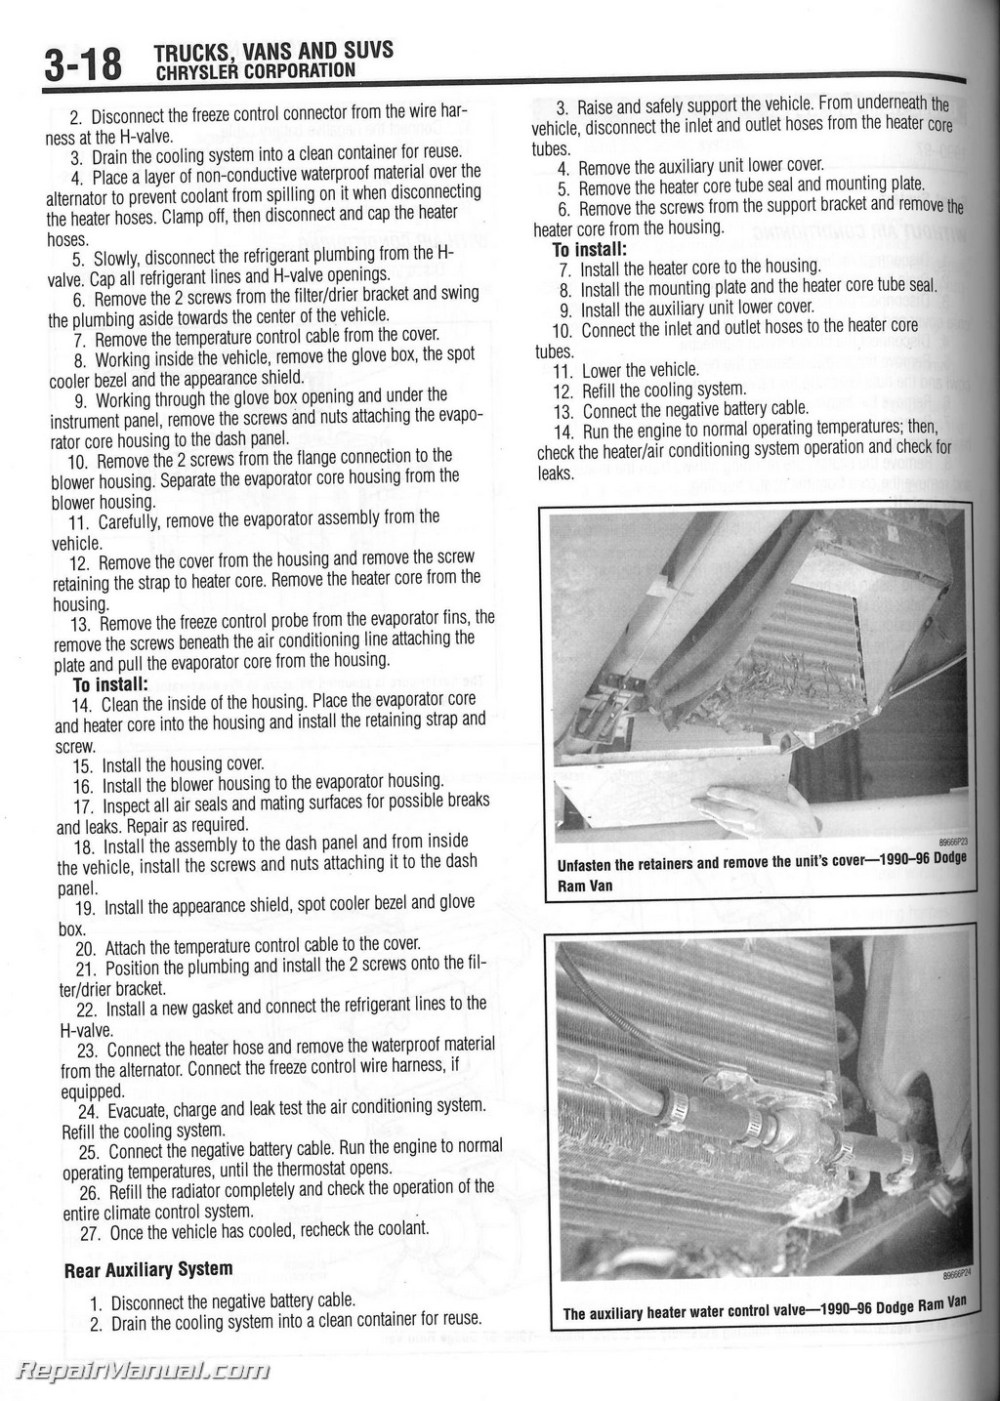 medium resolution of 1990 dodge ram heater core